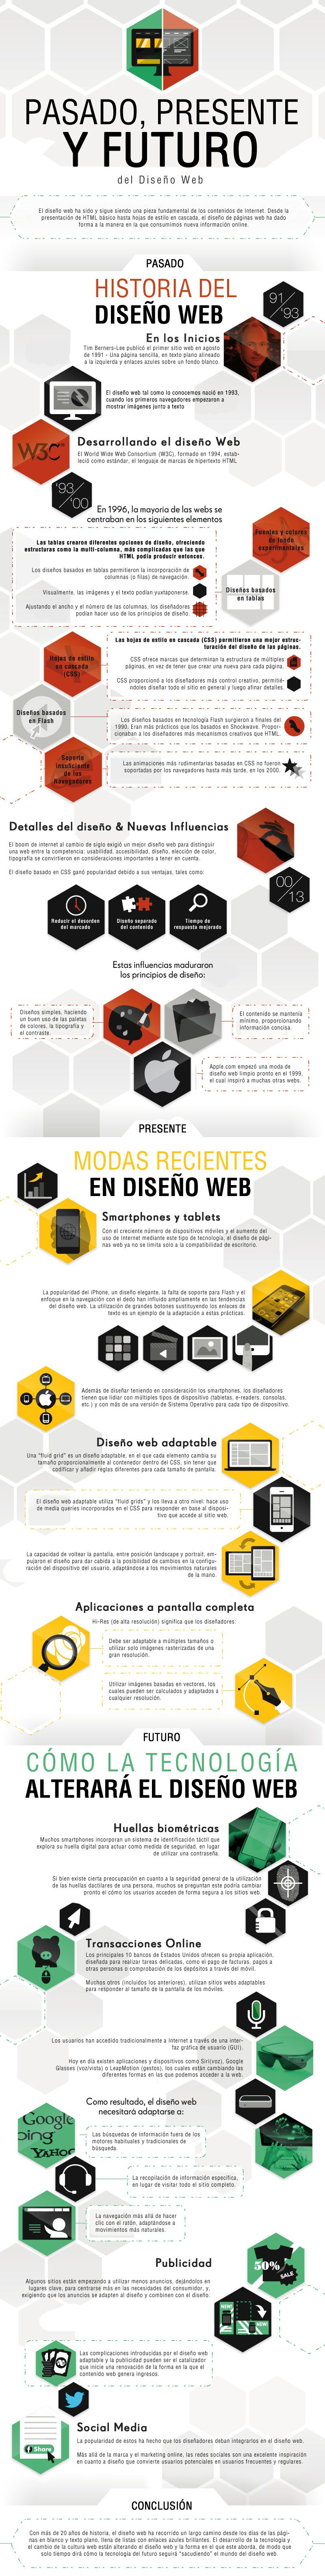 infografia-historia-diseño-web1